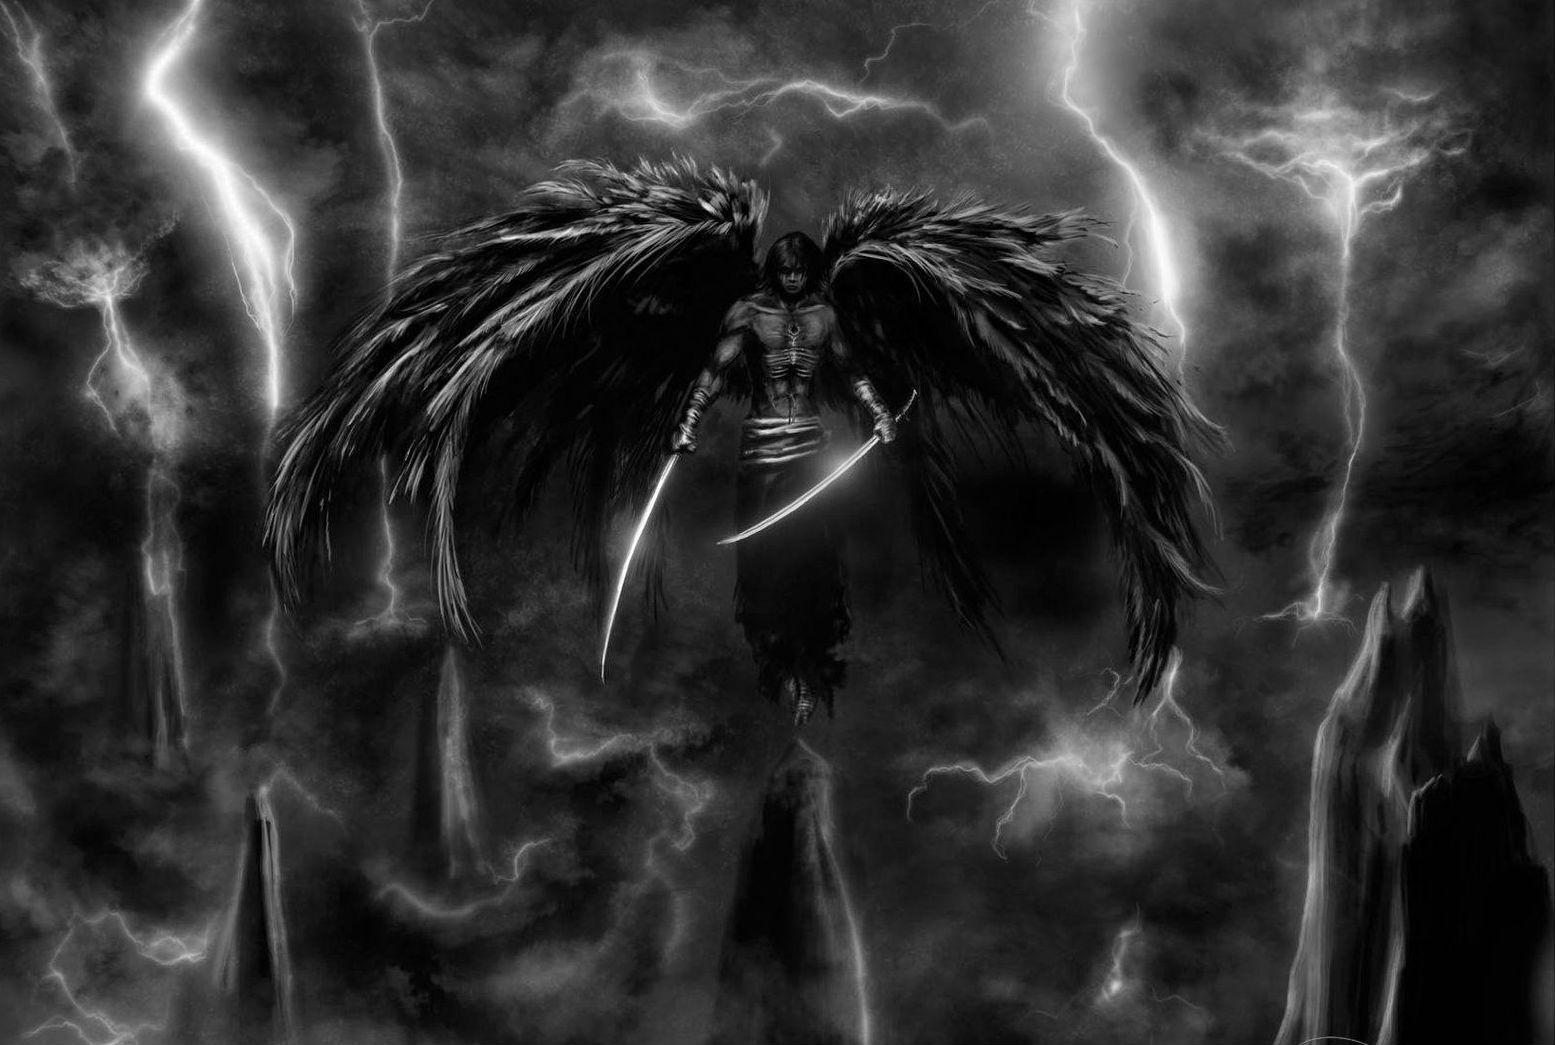 Angel wallpaper and background image 1555x1045 id203970 dark angel warrior anime wallpaper voltagebd Images